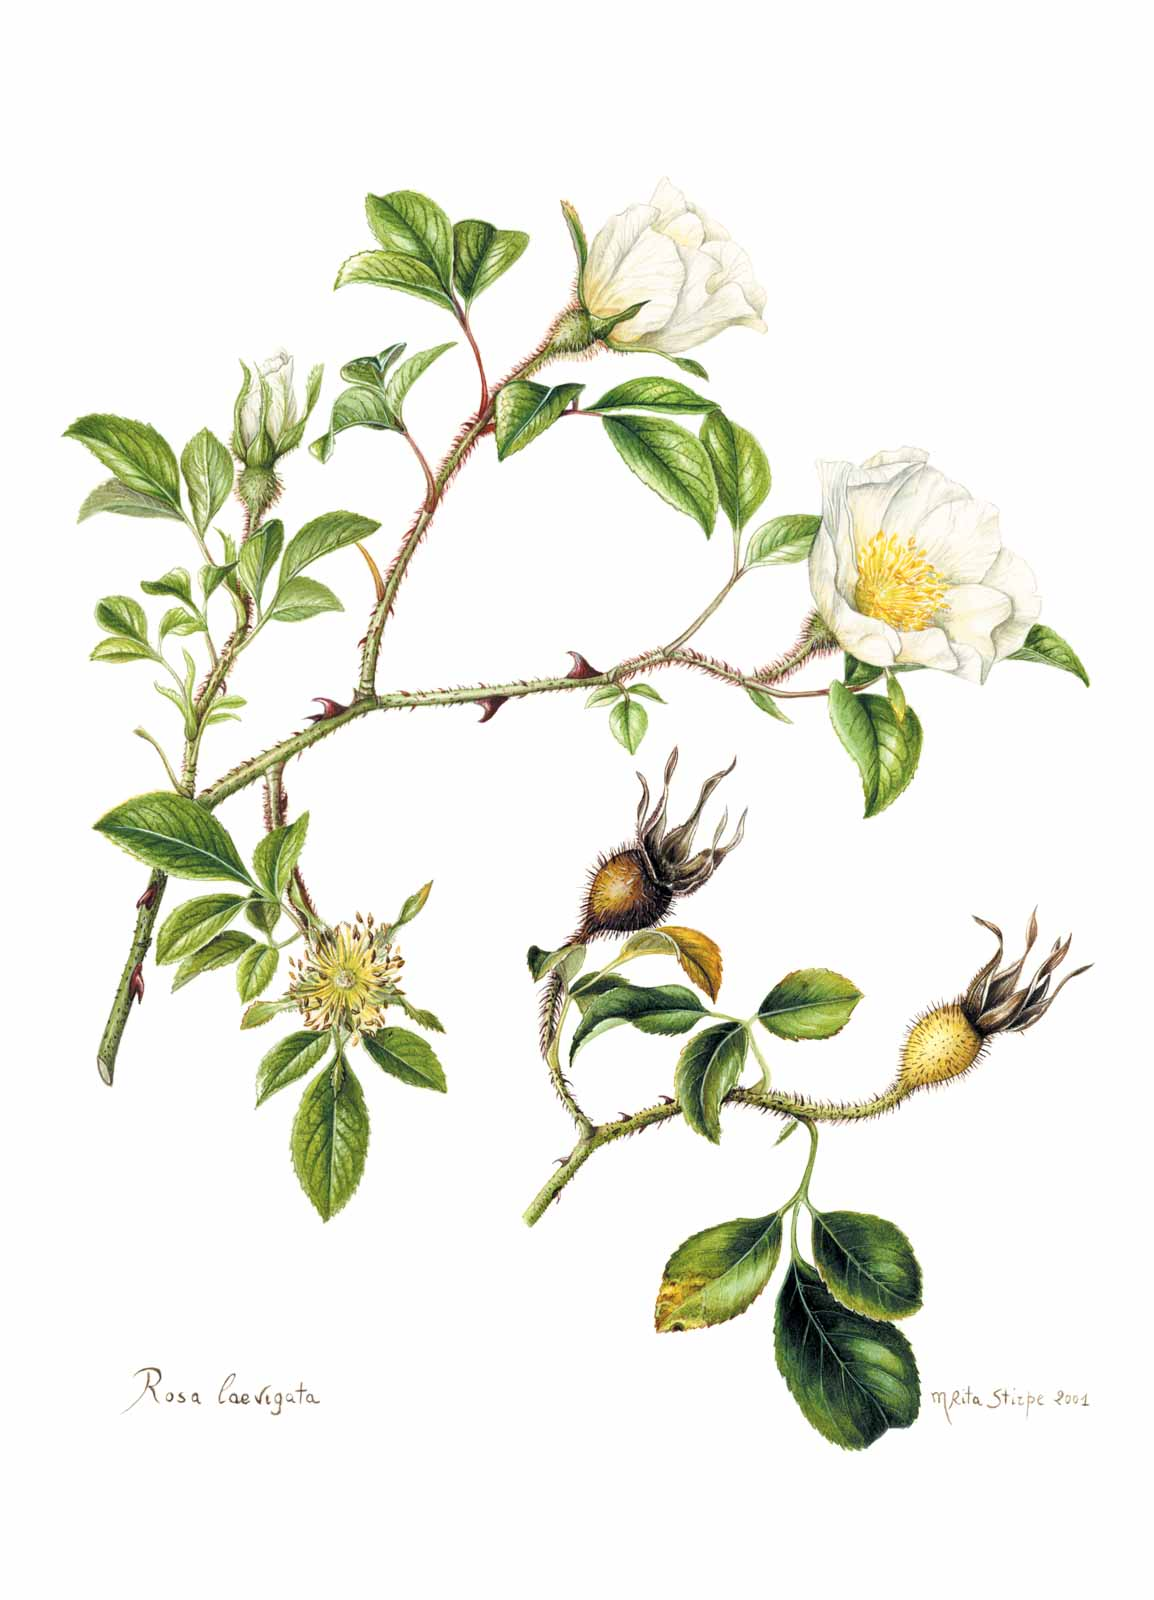 Catalogo - Ars Botanica - Stampa 17